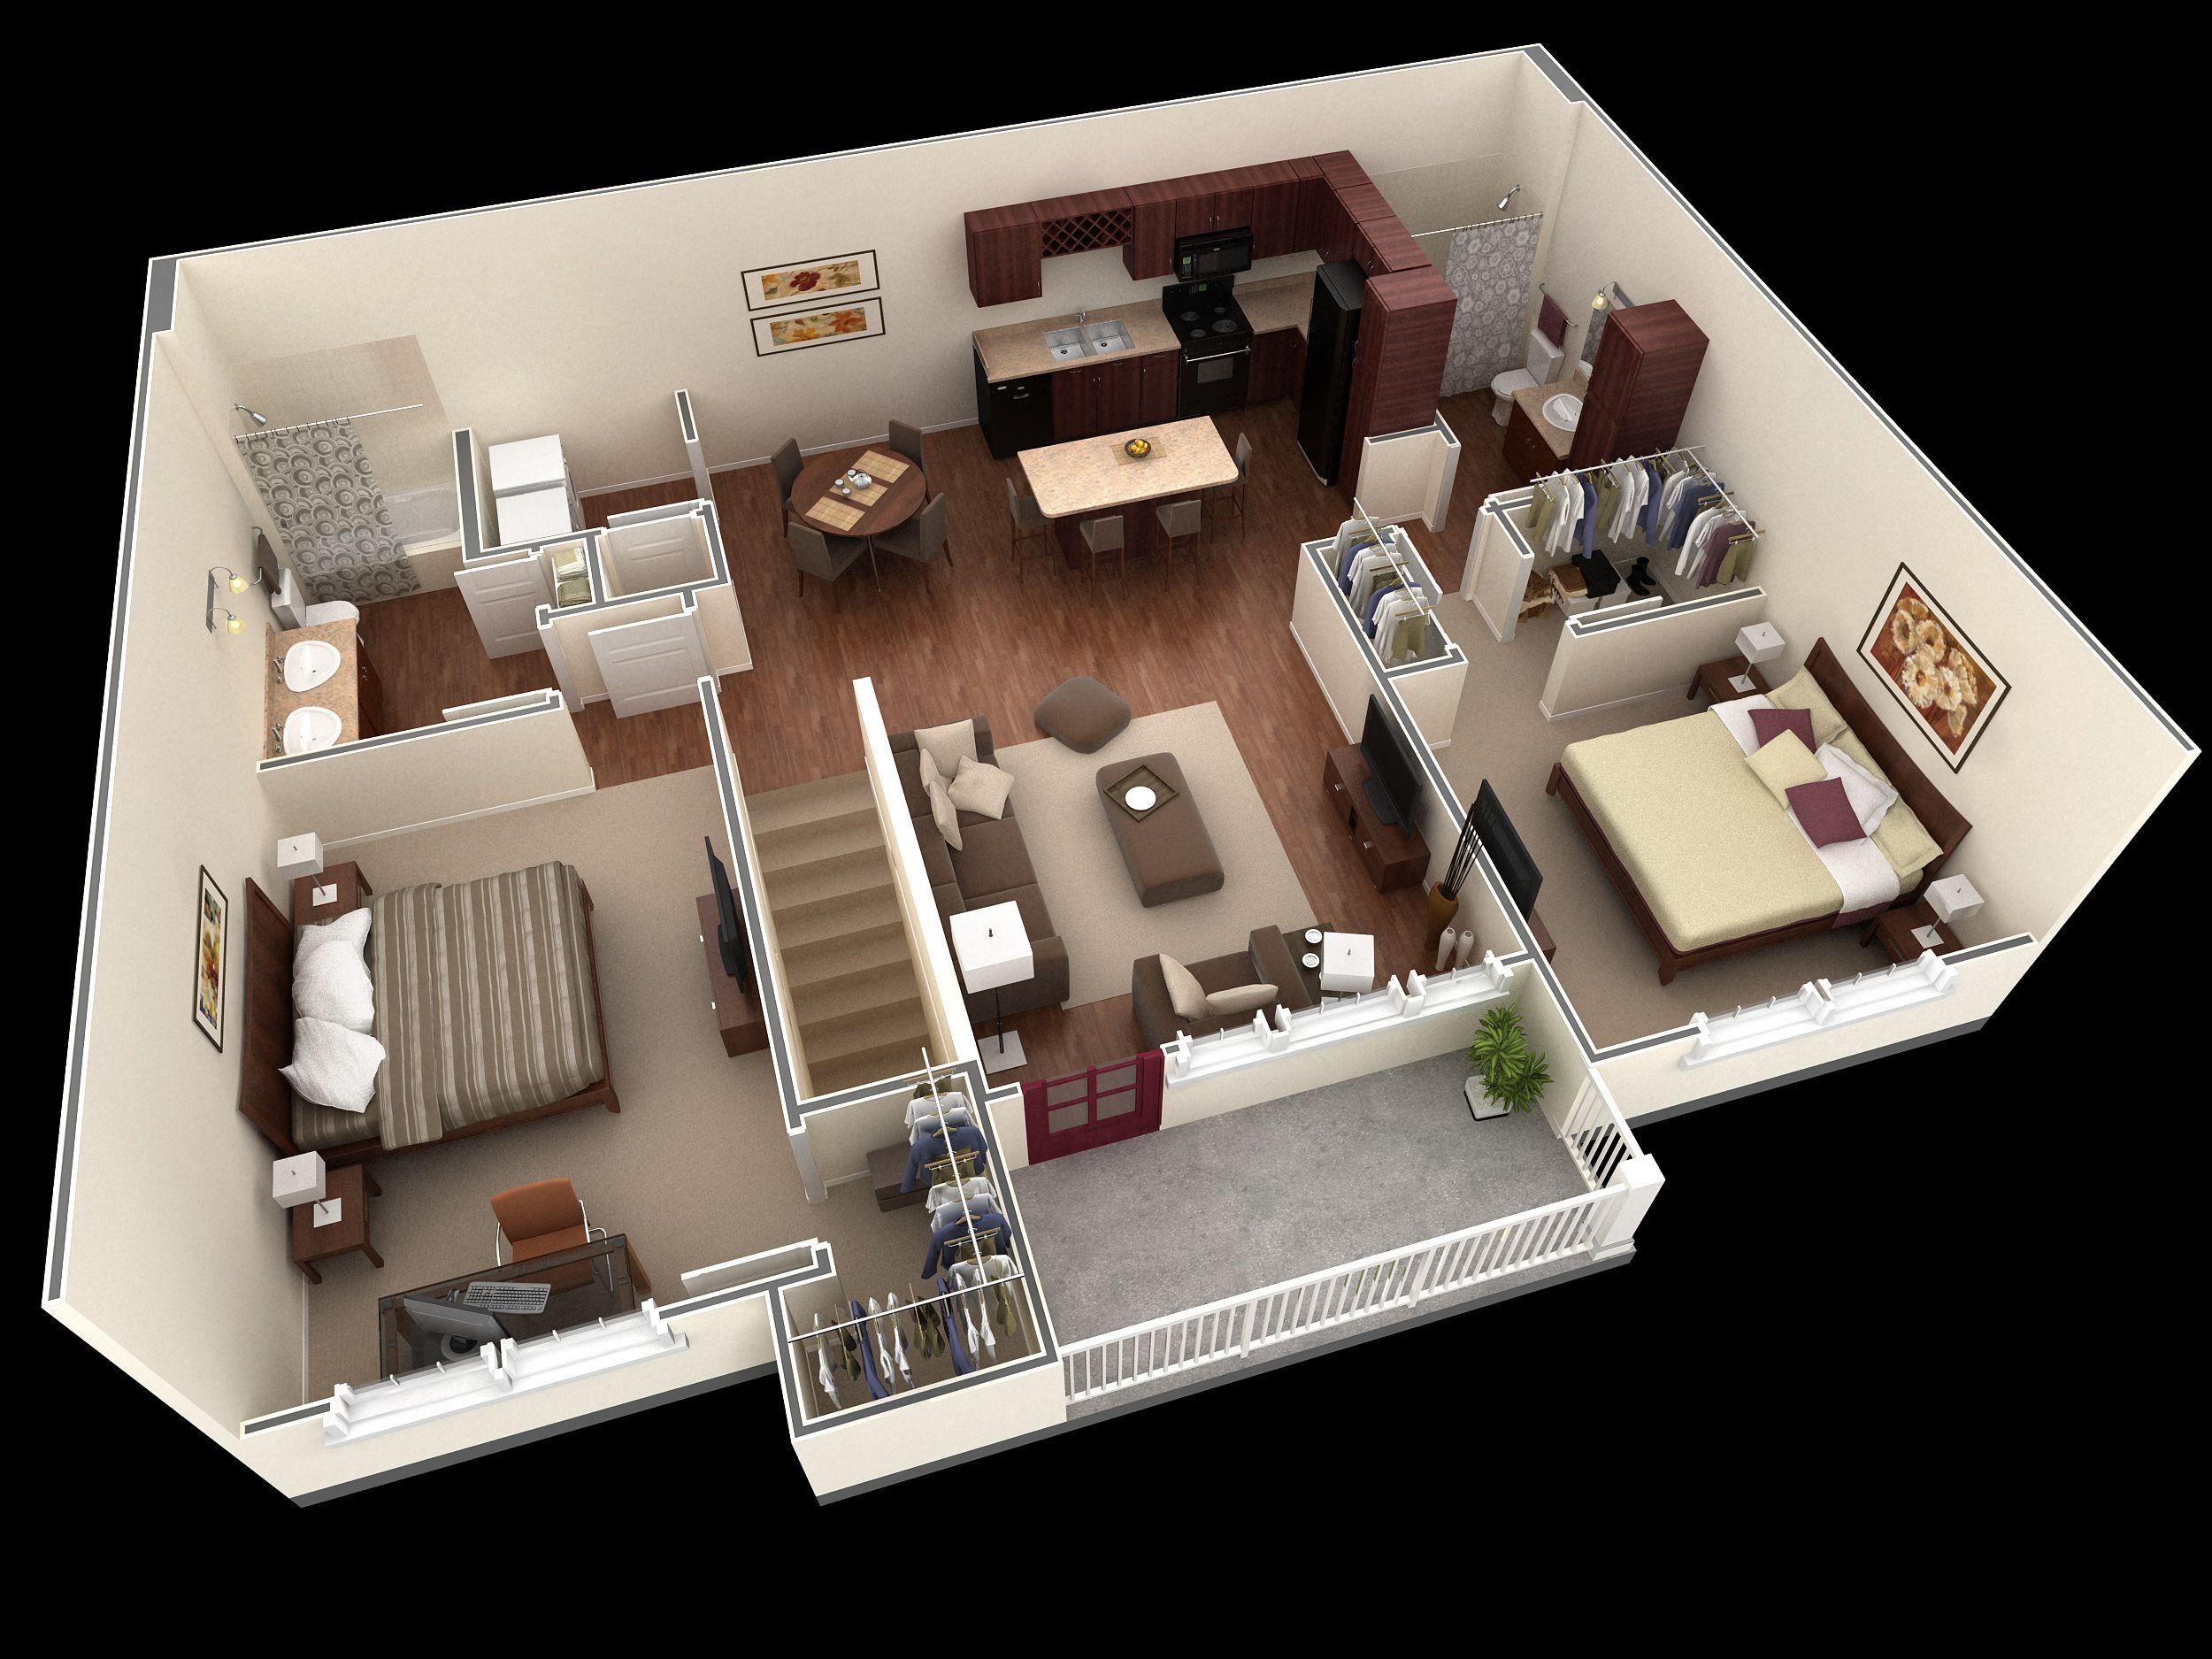 2 Bedroom Grand Overlook 2 Bedroom 2 Bath 1088 Sf Apartment At